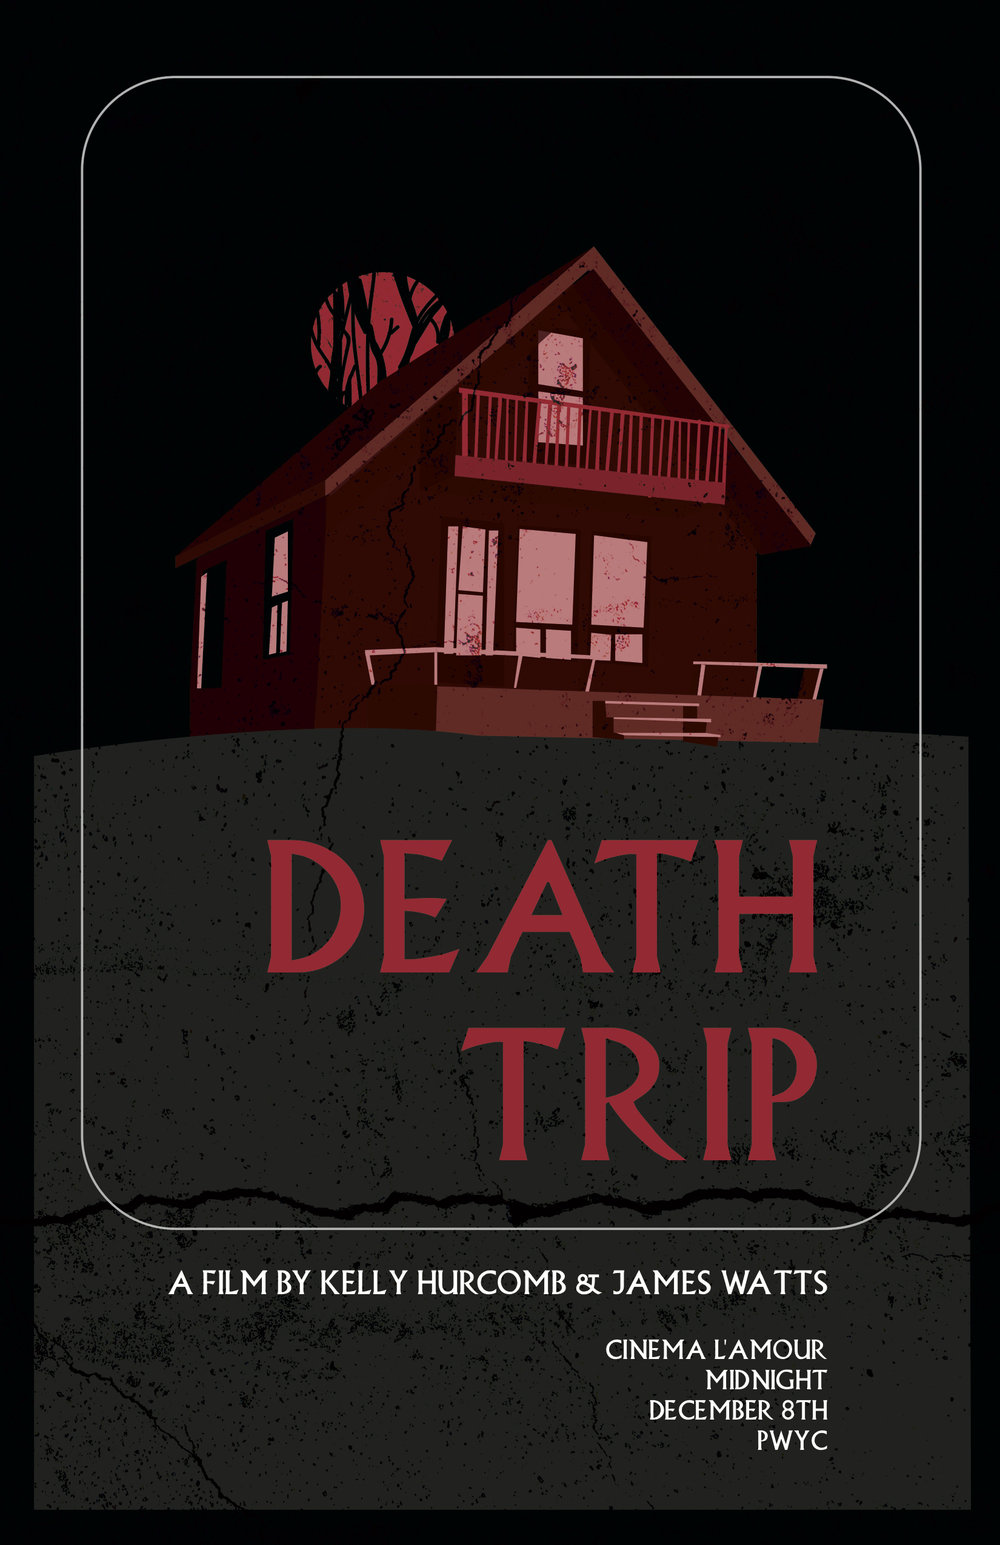 death-trip-poster.jpg